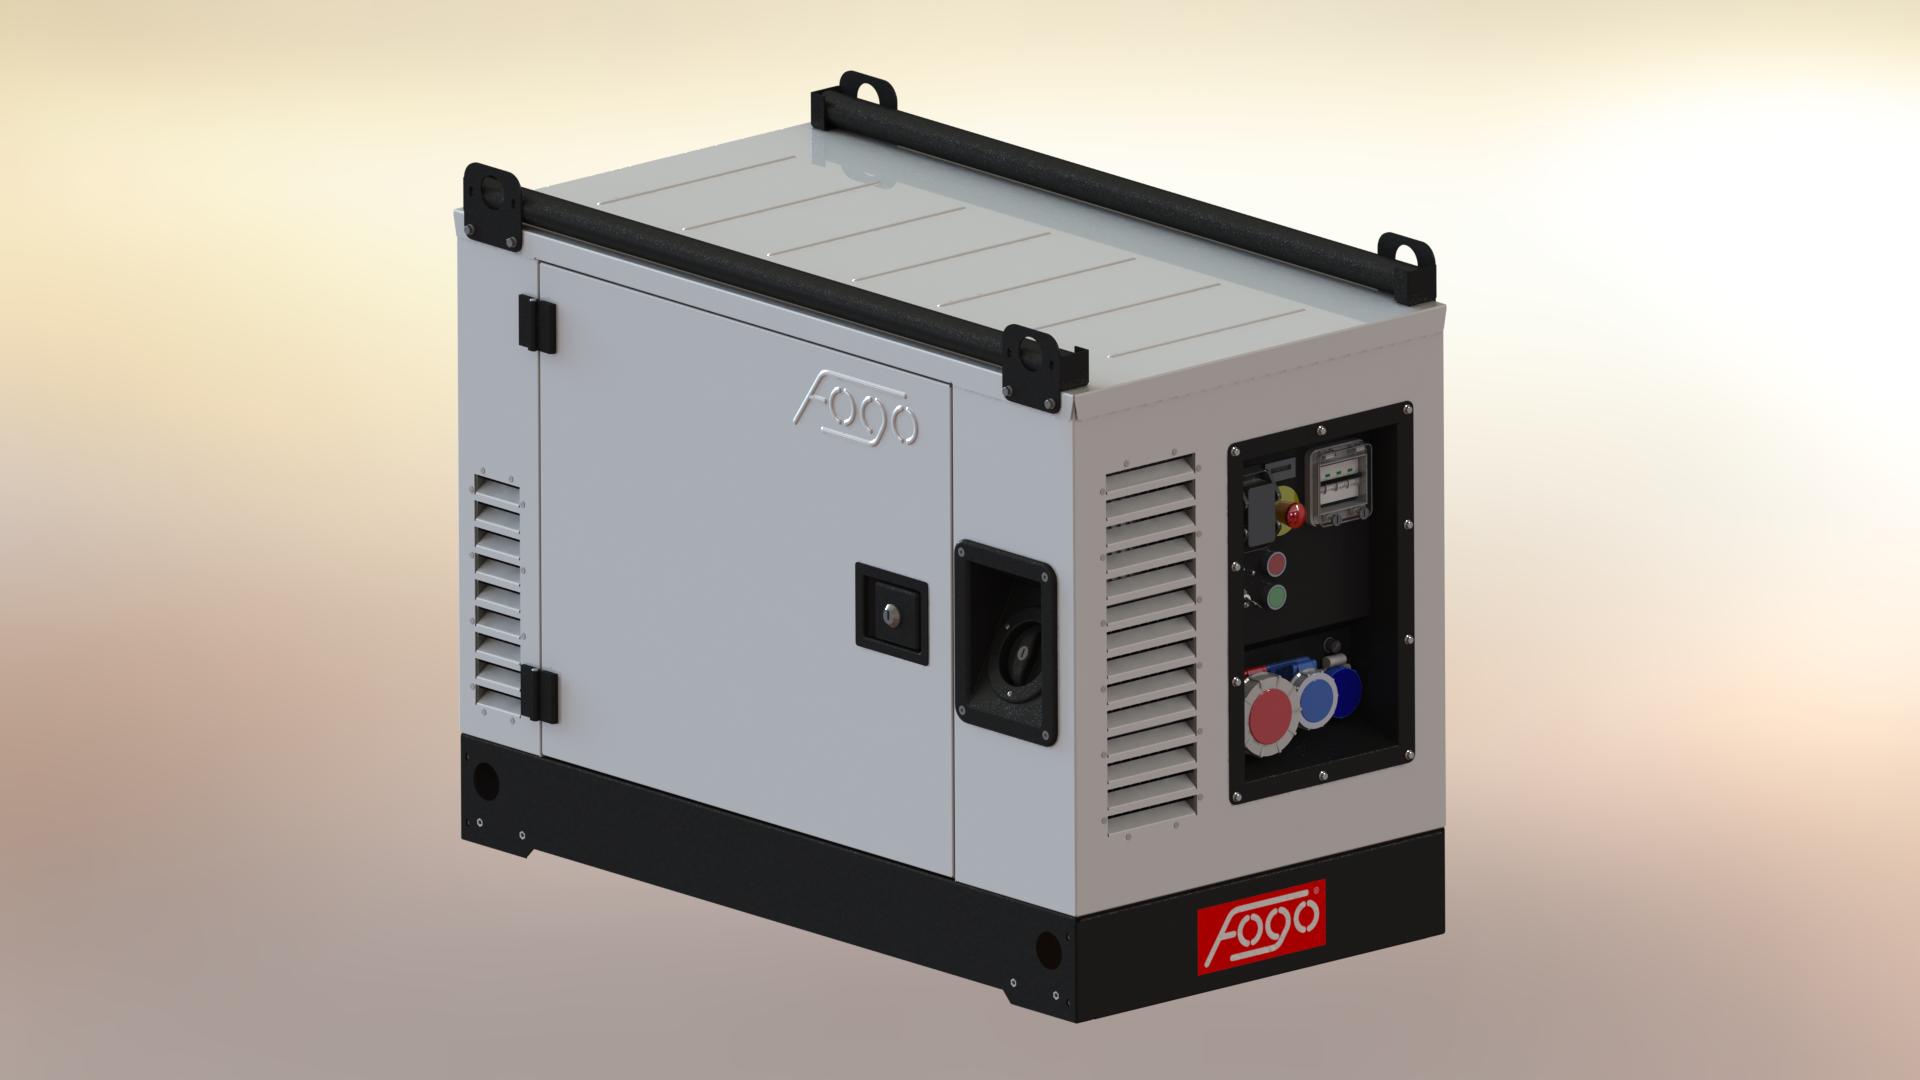 FOGO B&S VANGUARD 14.5 kVA Stromaggregat AVR E-Start FV 15000CRA